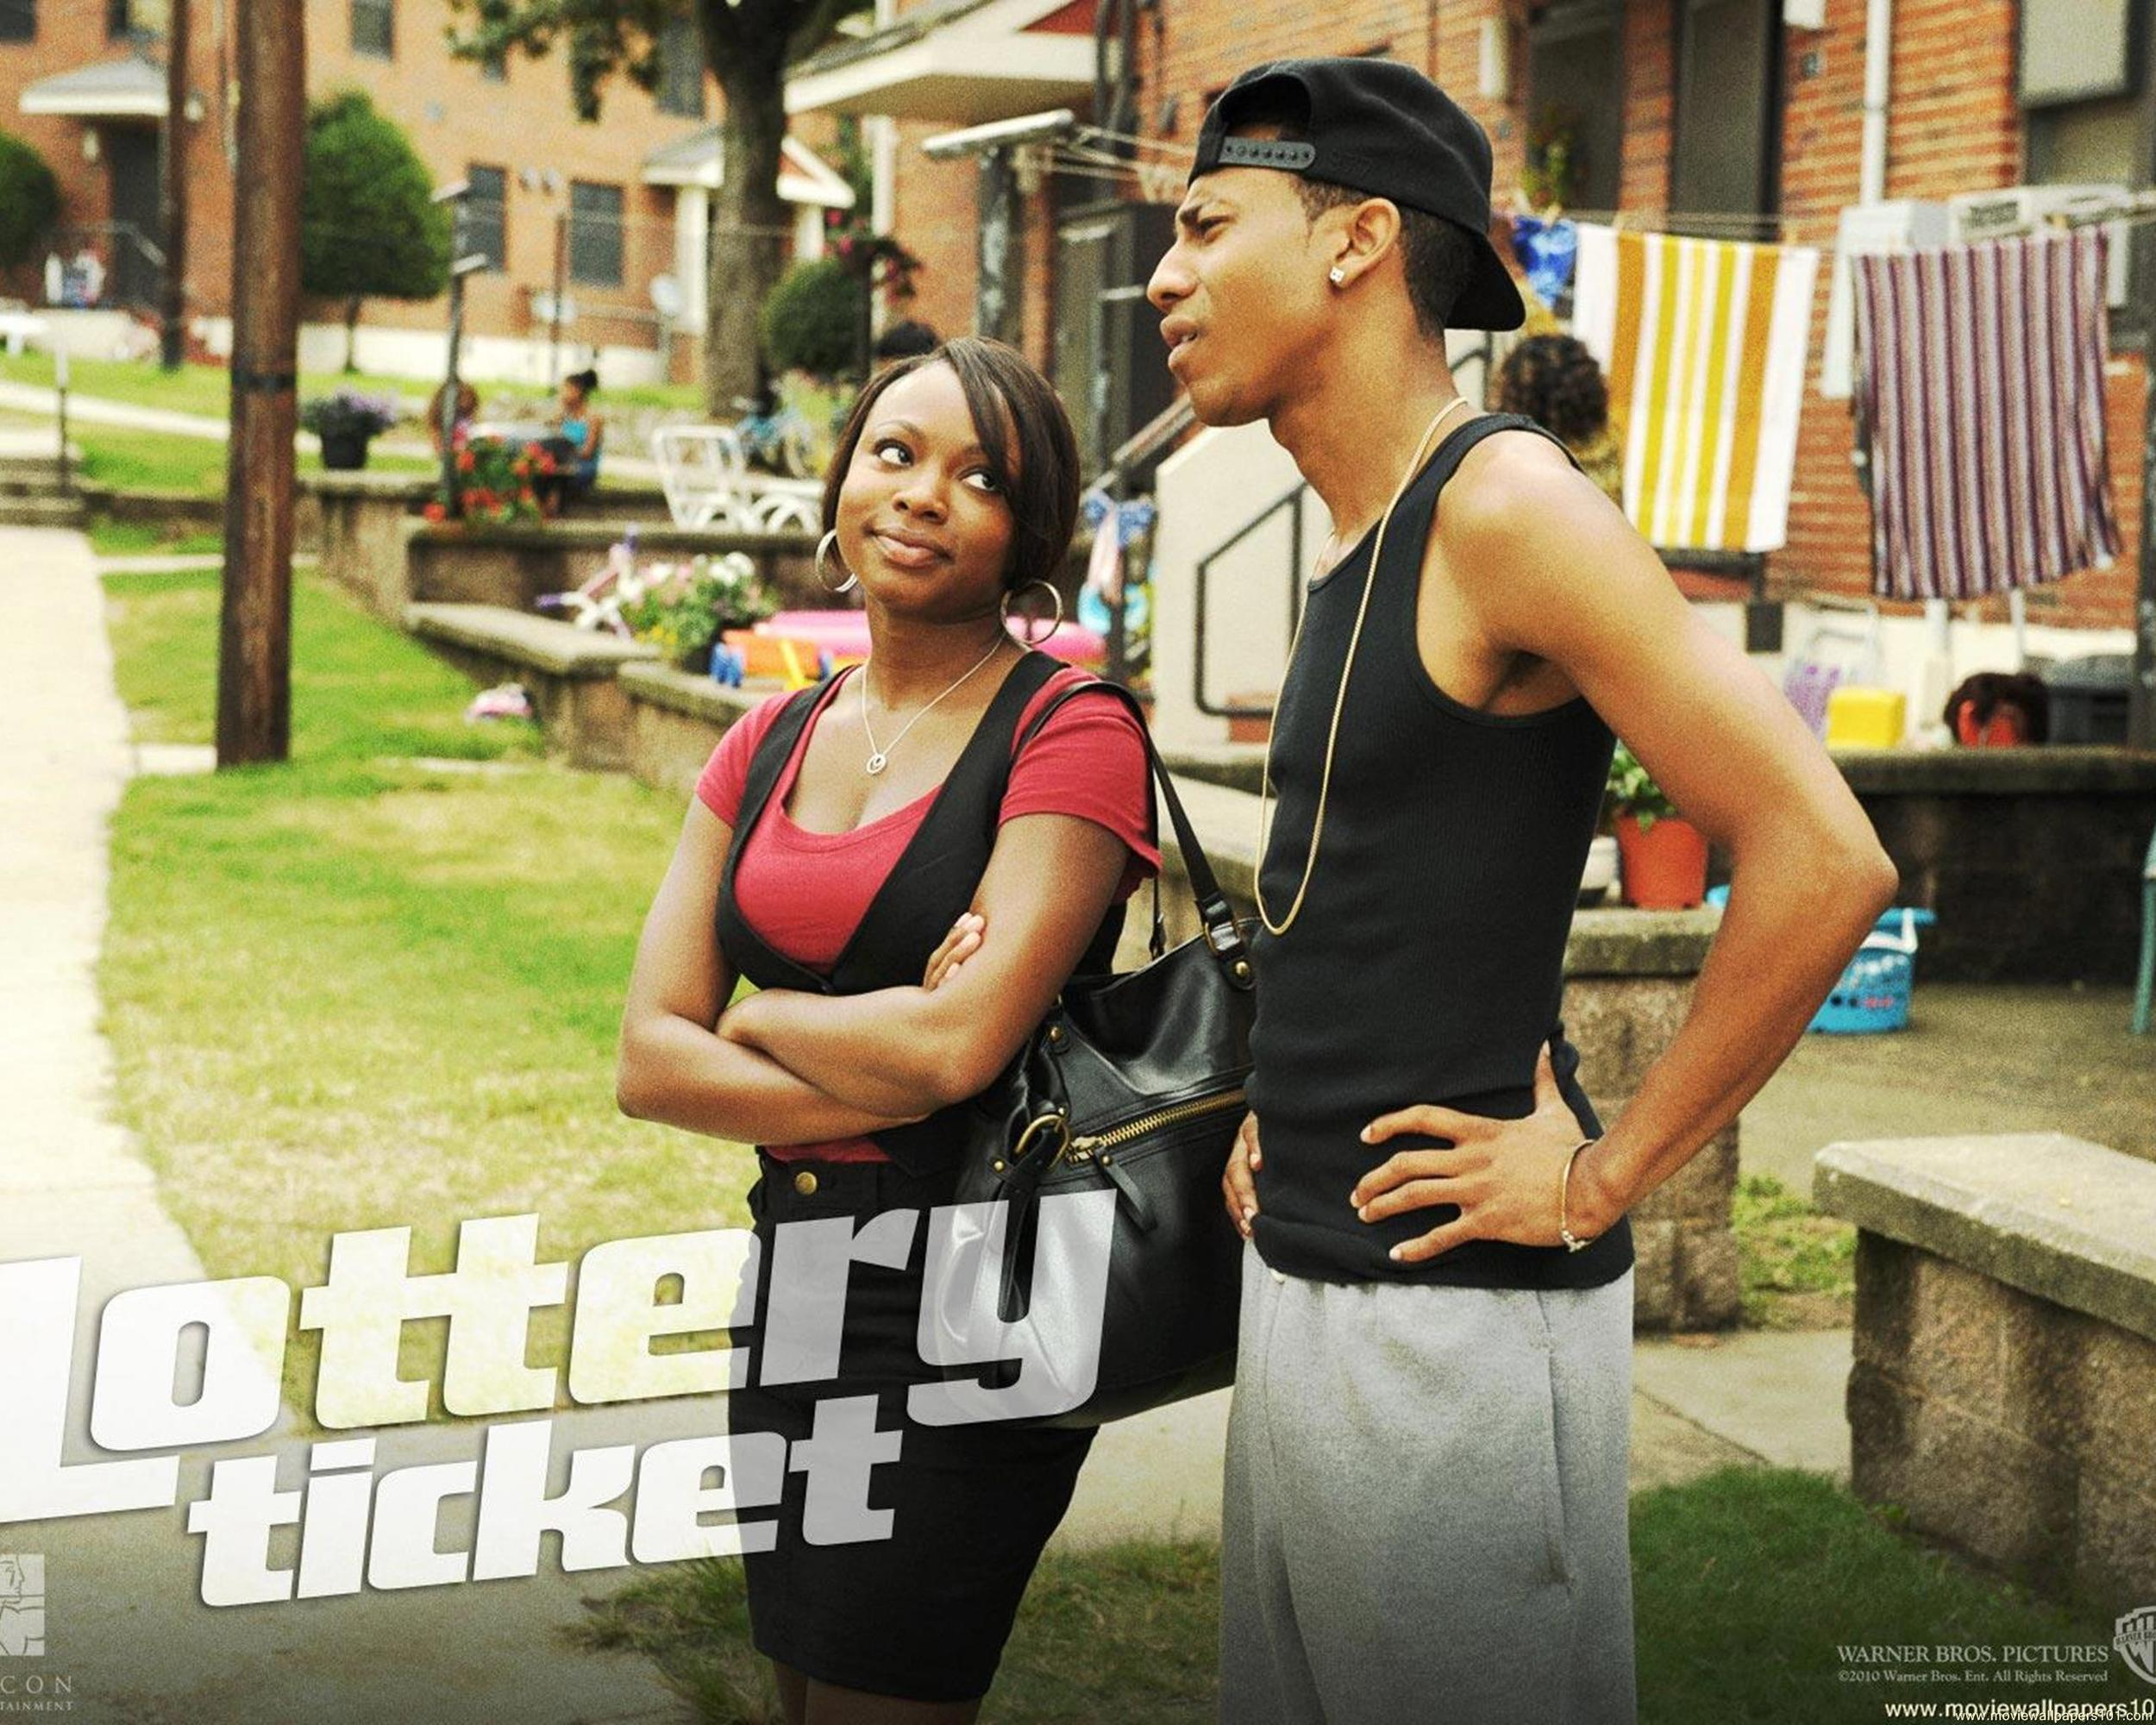 lottery ticket full movie free hd